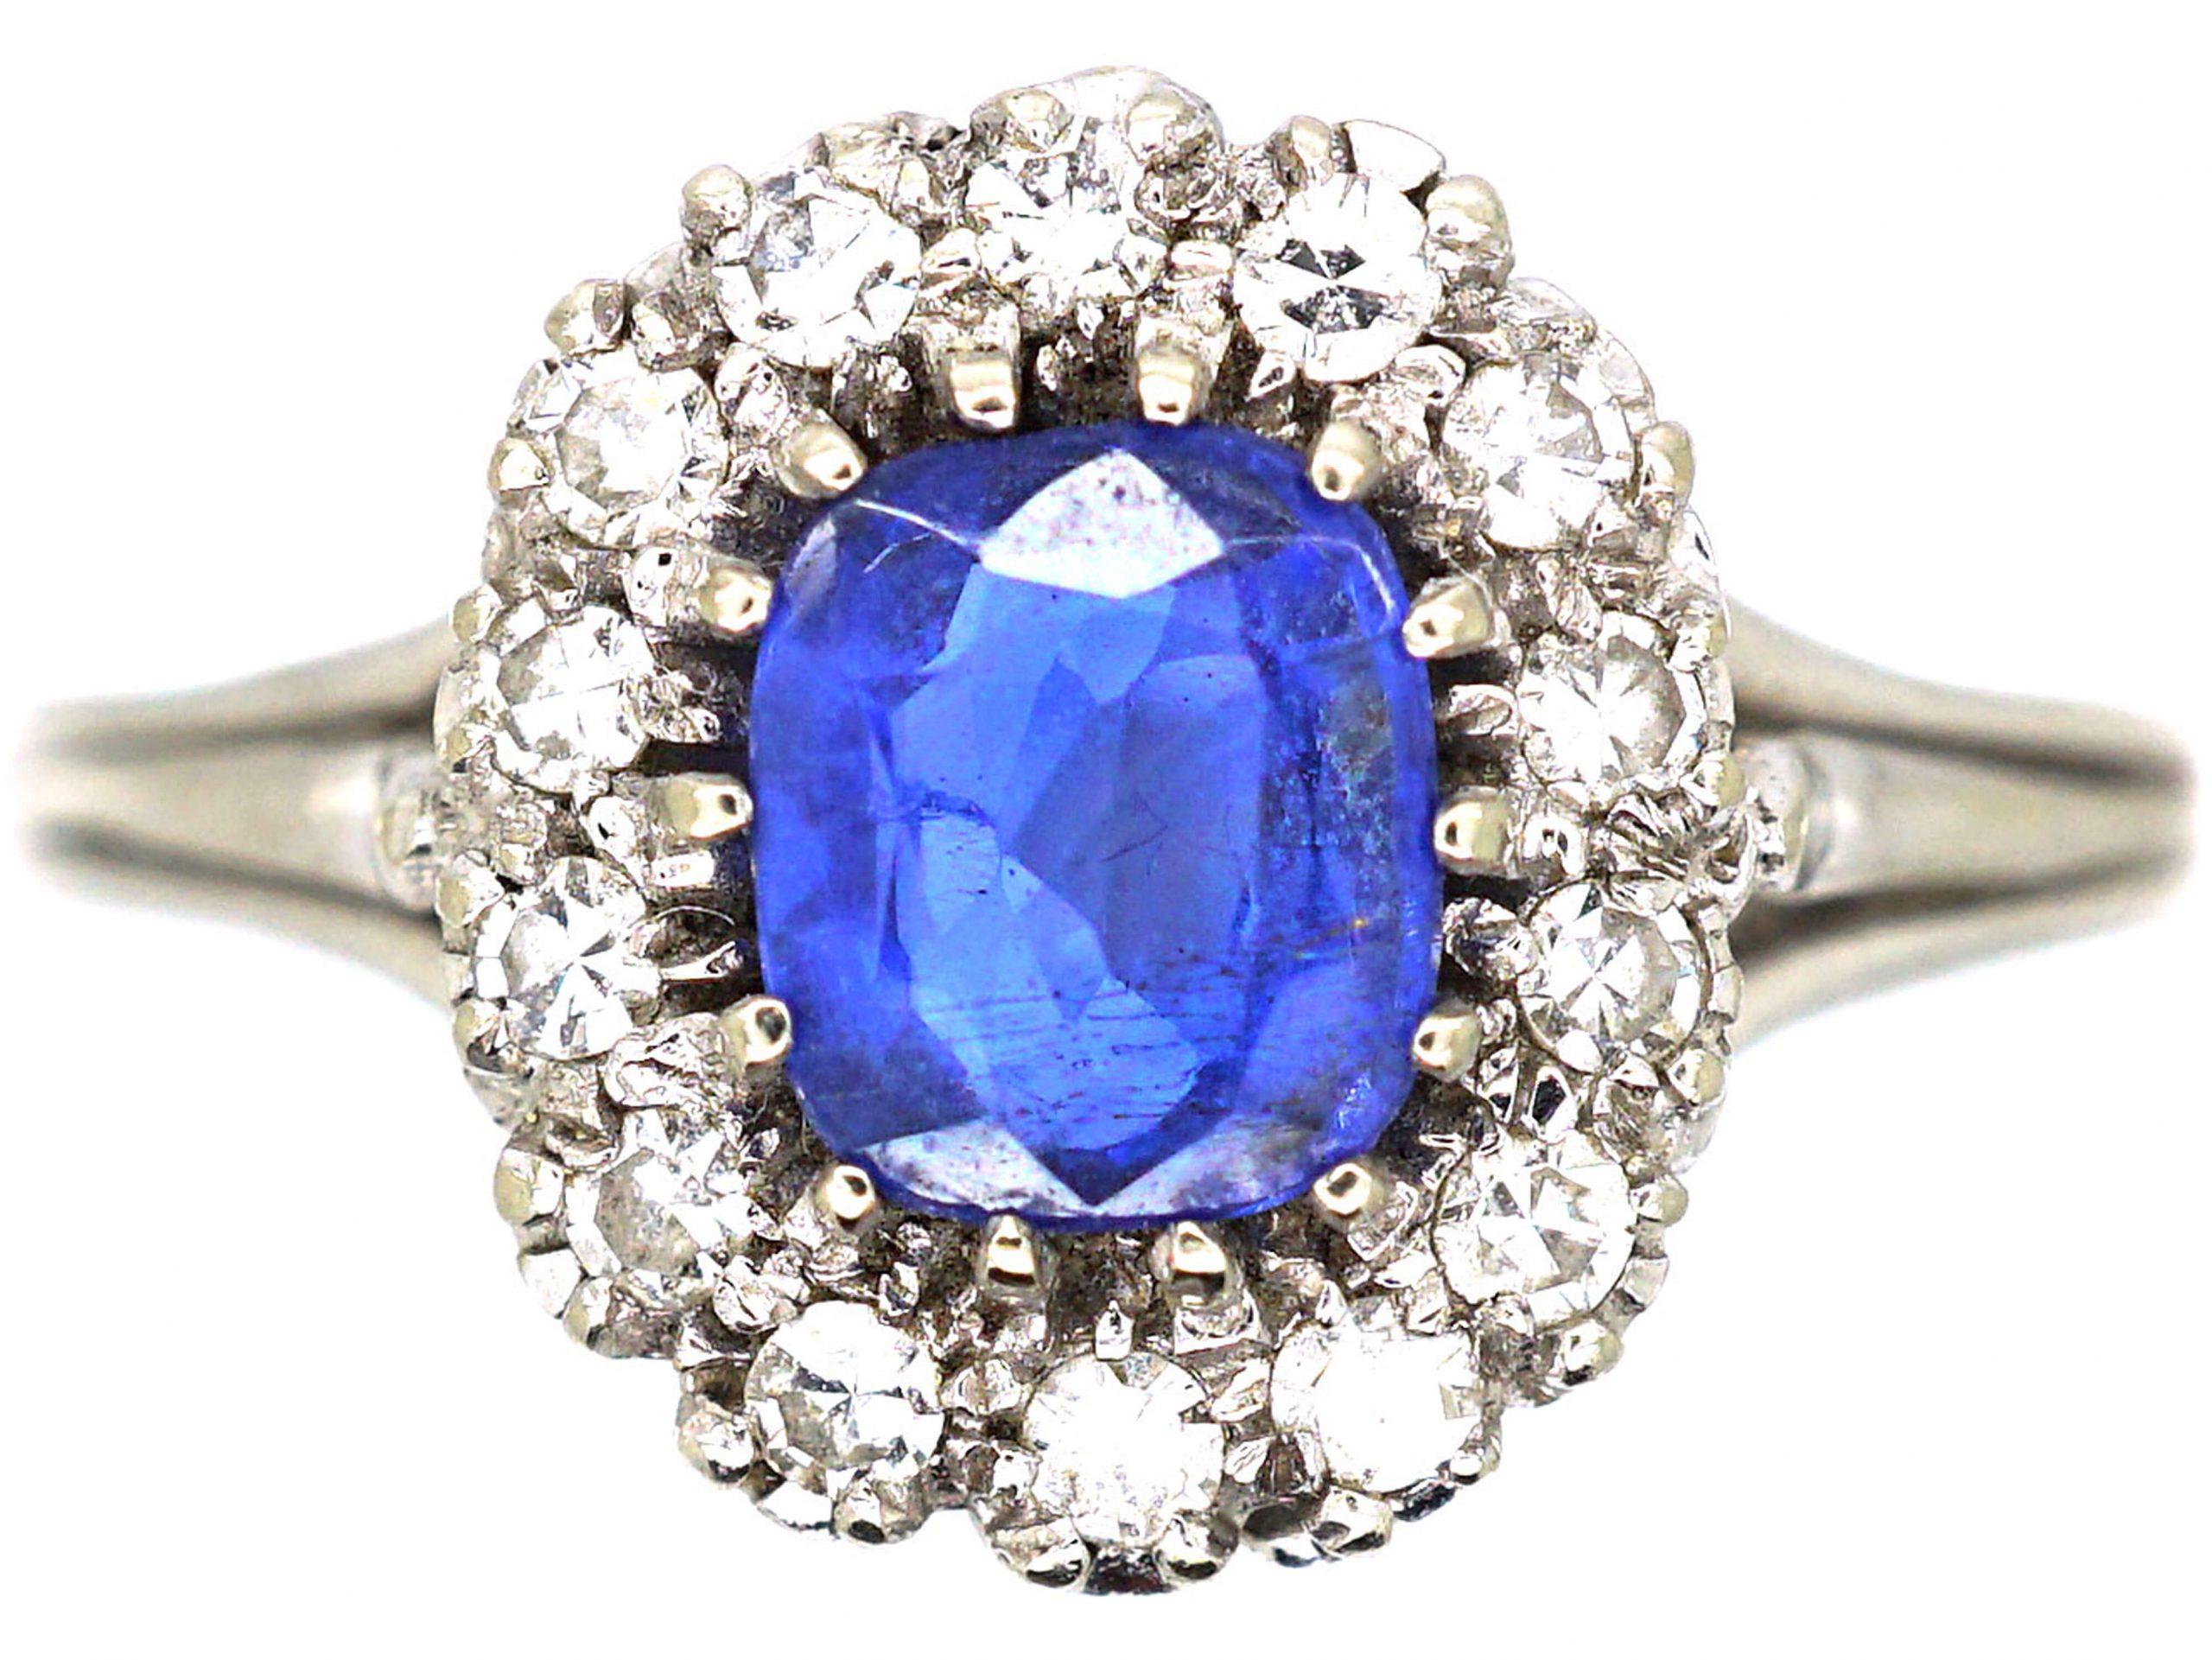 Art Deco 18ct White Gold, Sapphire & Diamond Cluster Ring